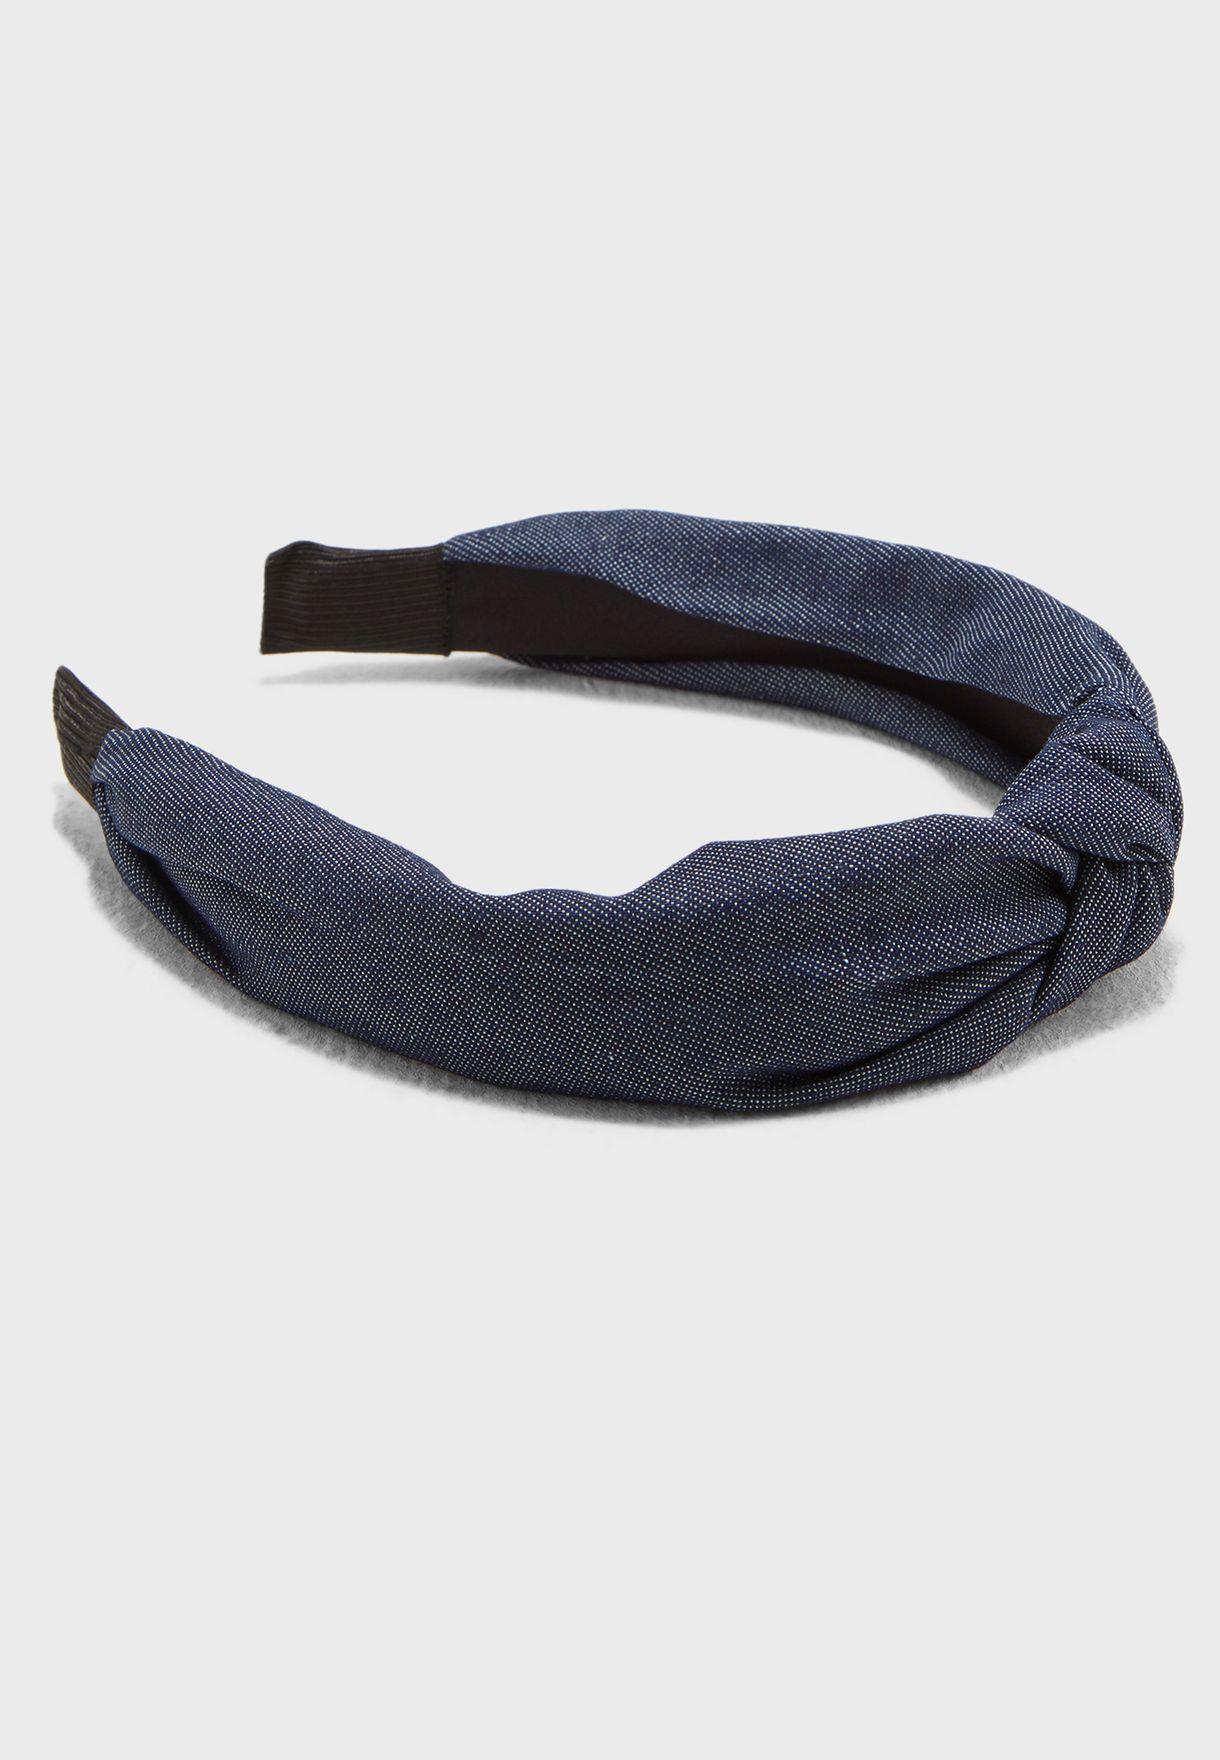 Knot front headband in denim